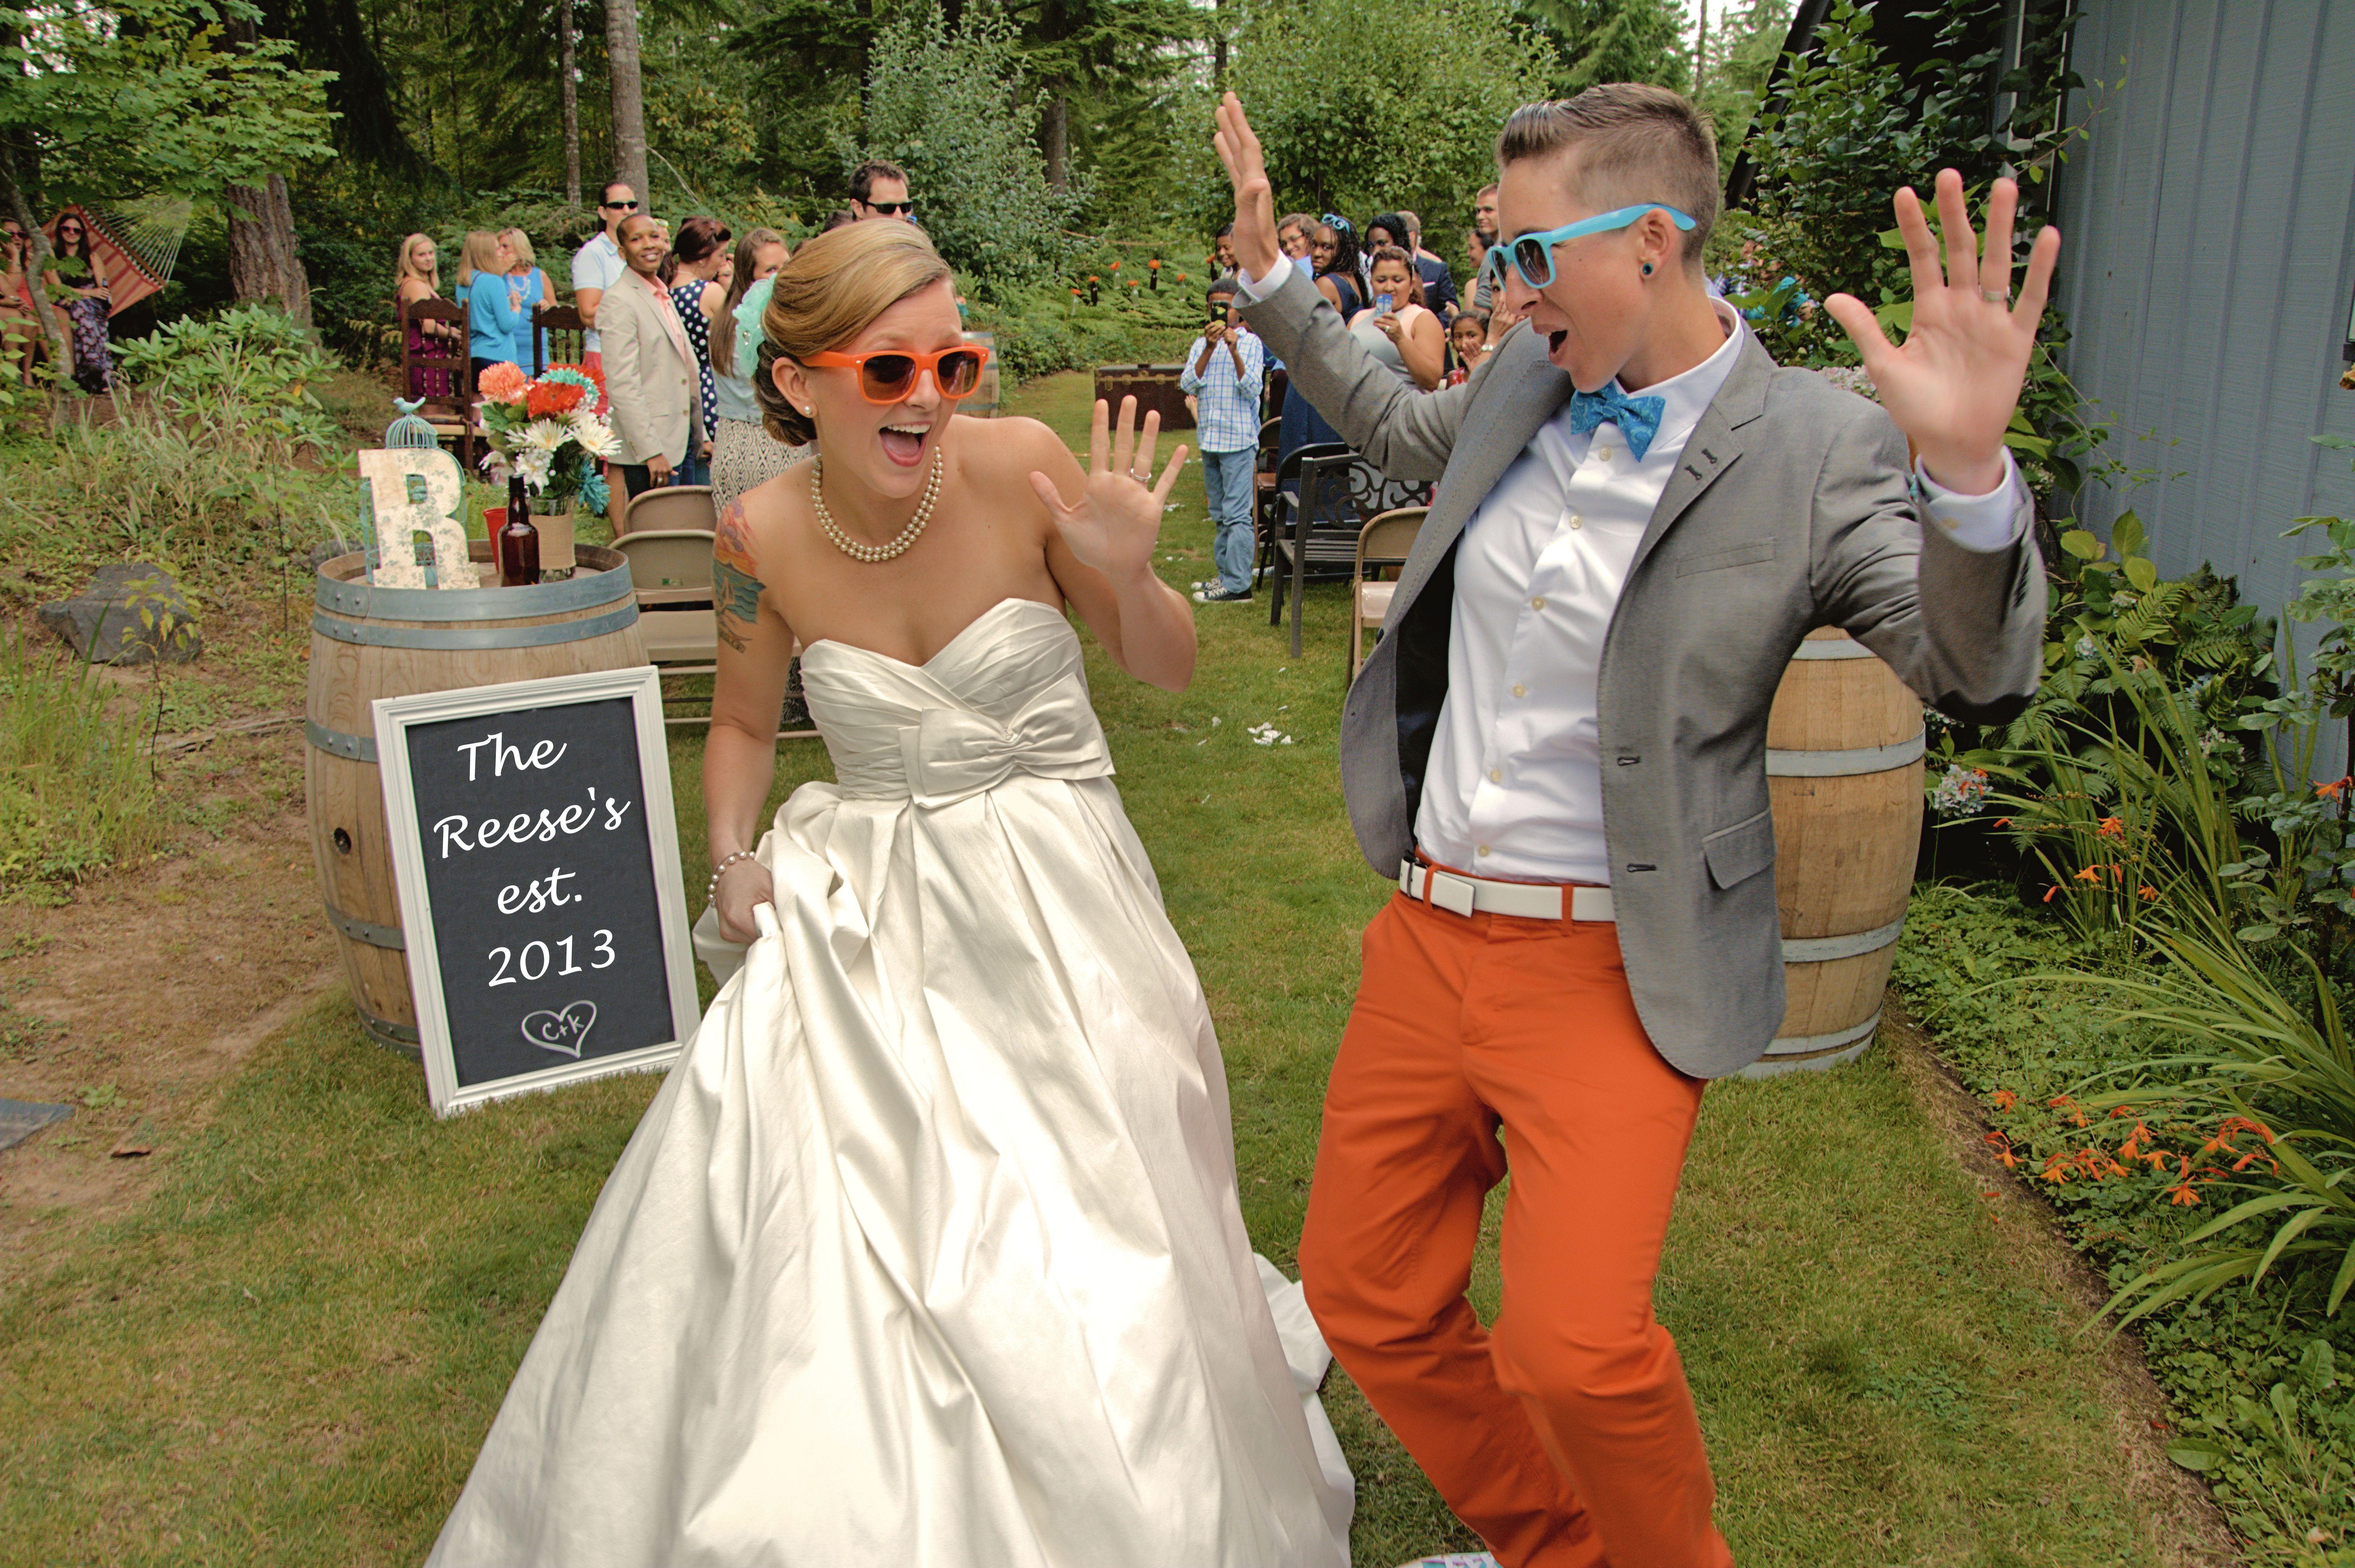 from Blake accessory gay wedding